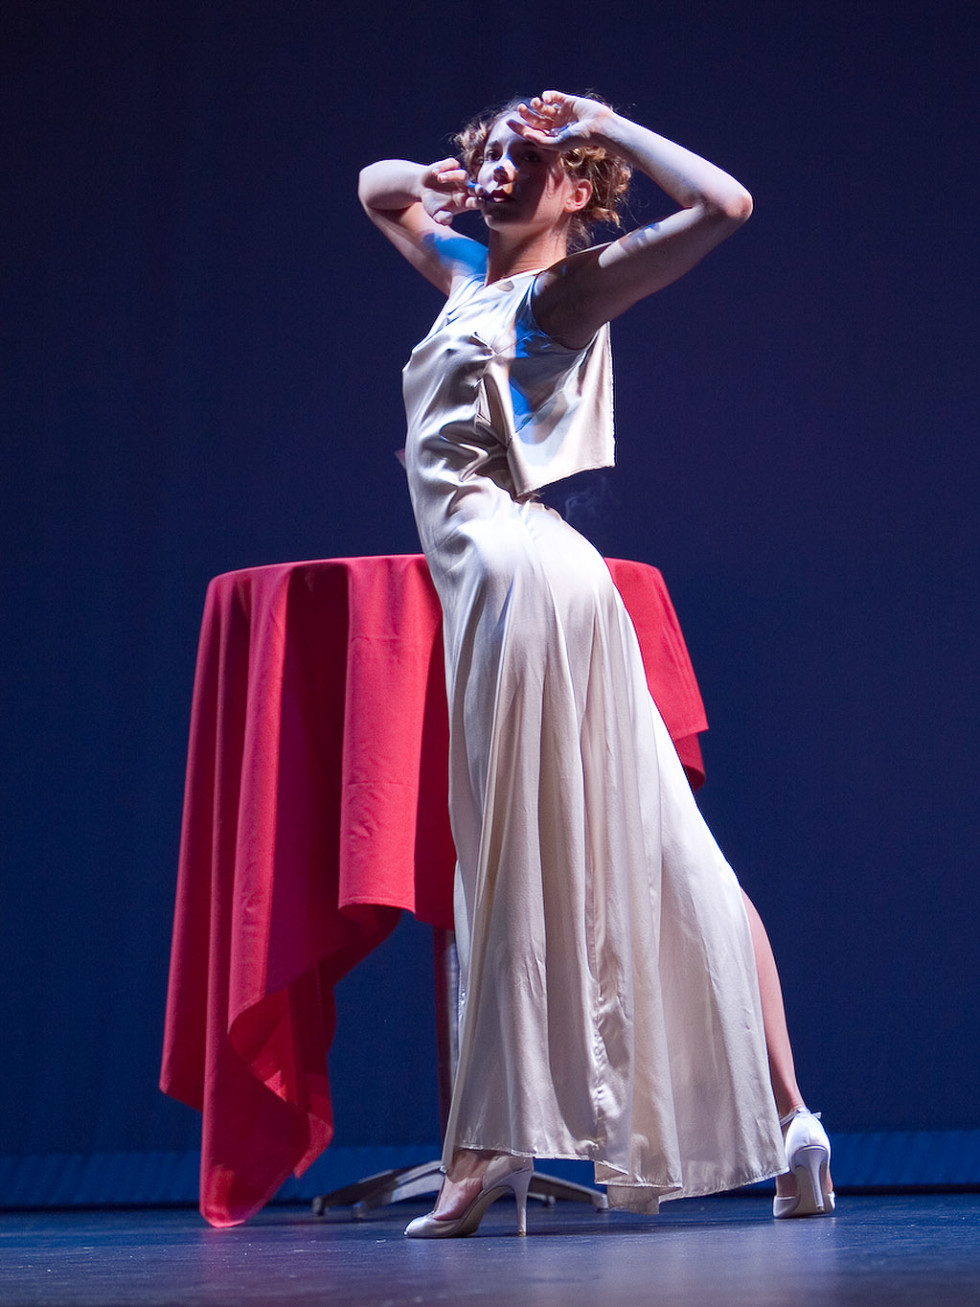 News_Rachel Meyer_Dominic Walsh Dance Theater